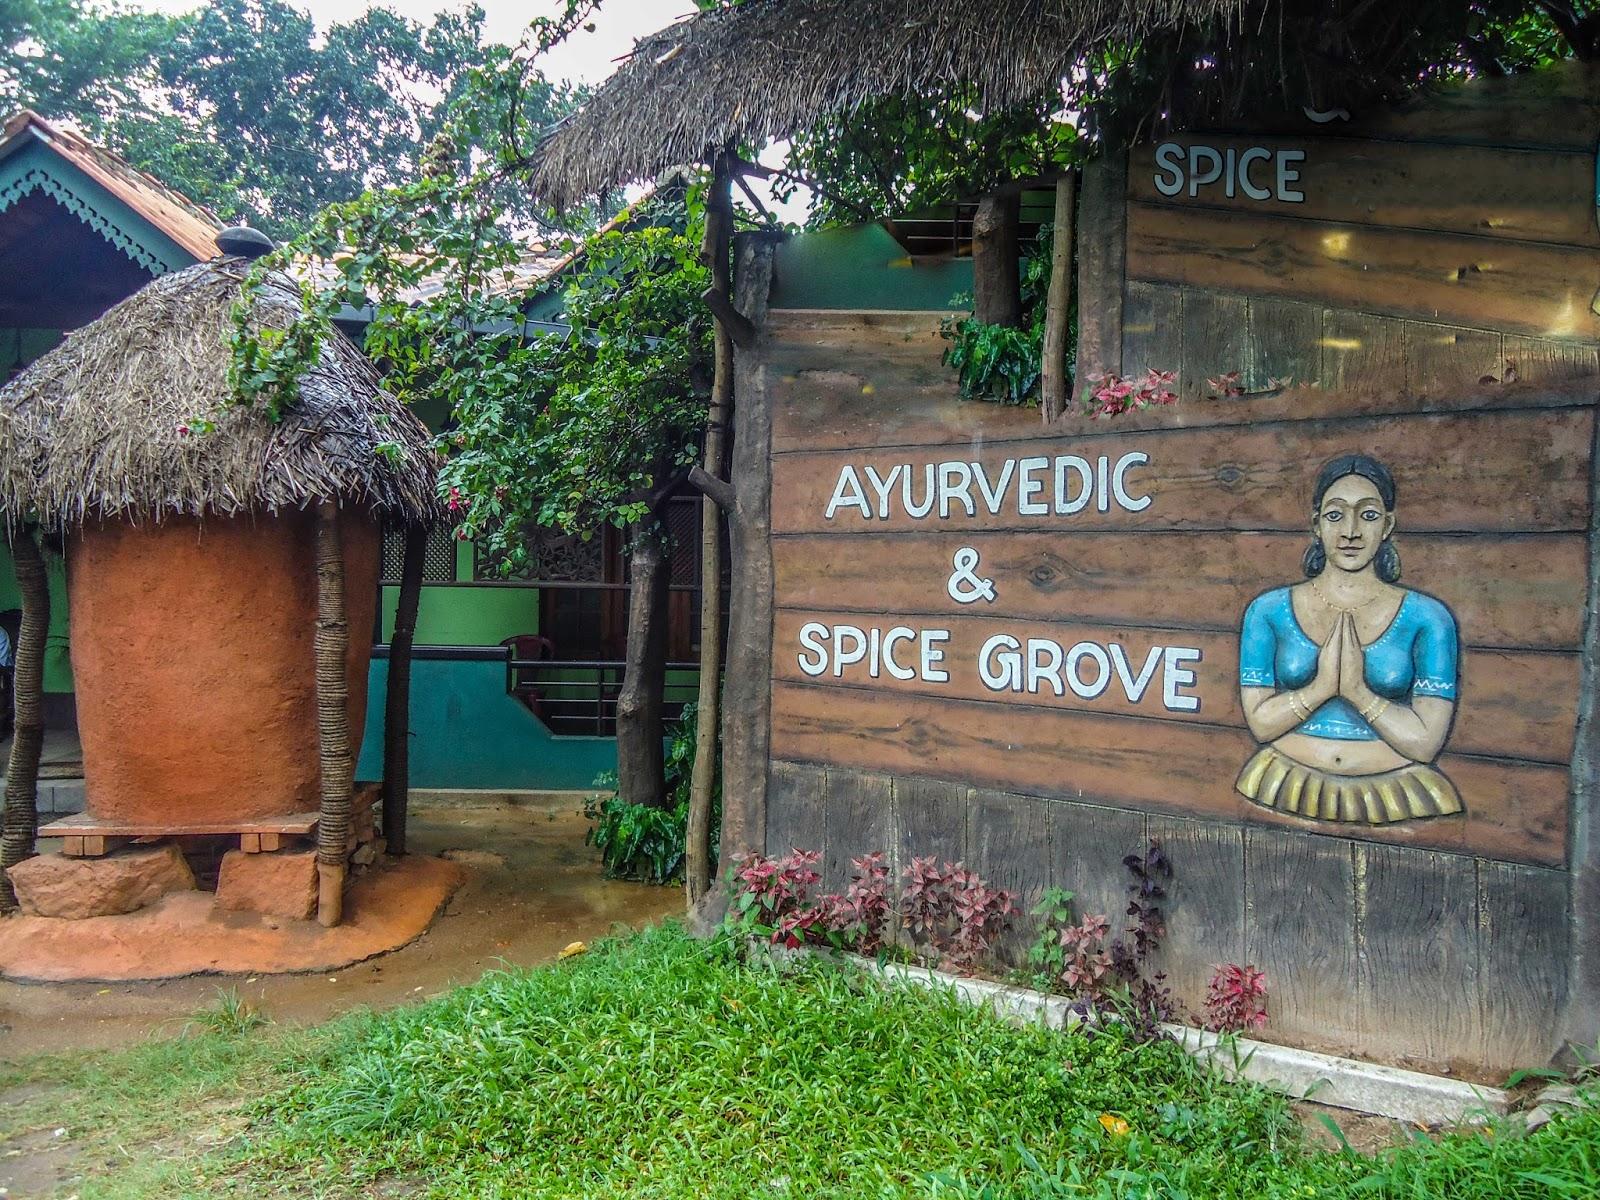 Best Spice Garden In Sri LAnka